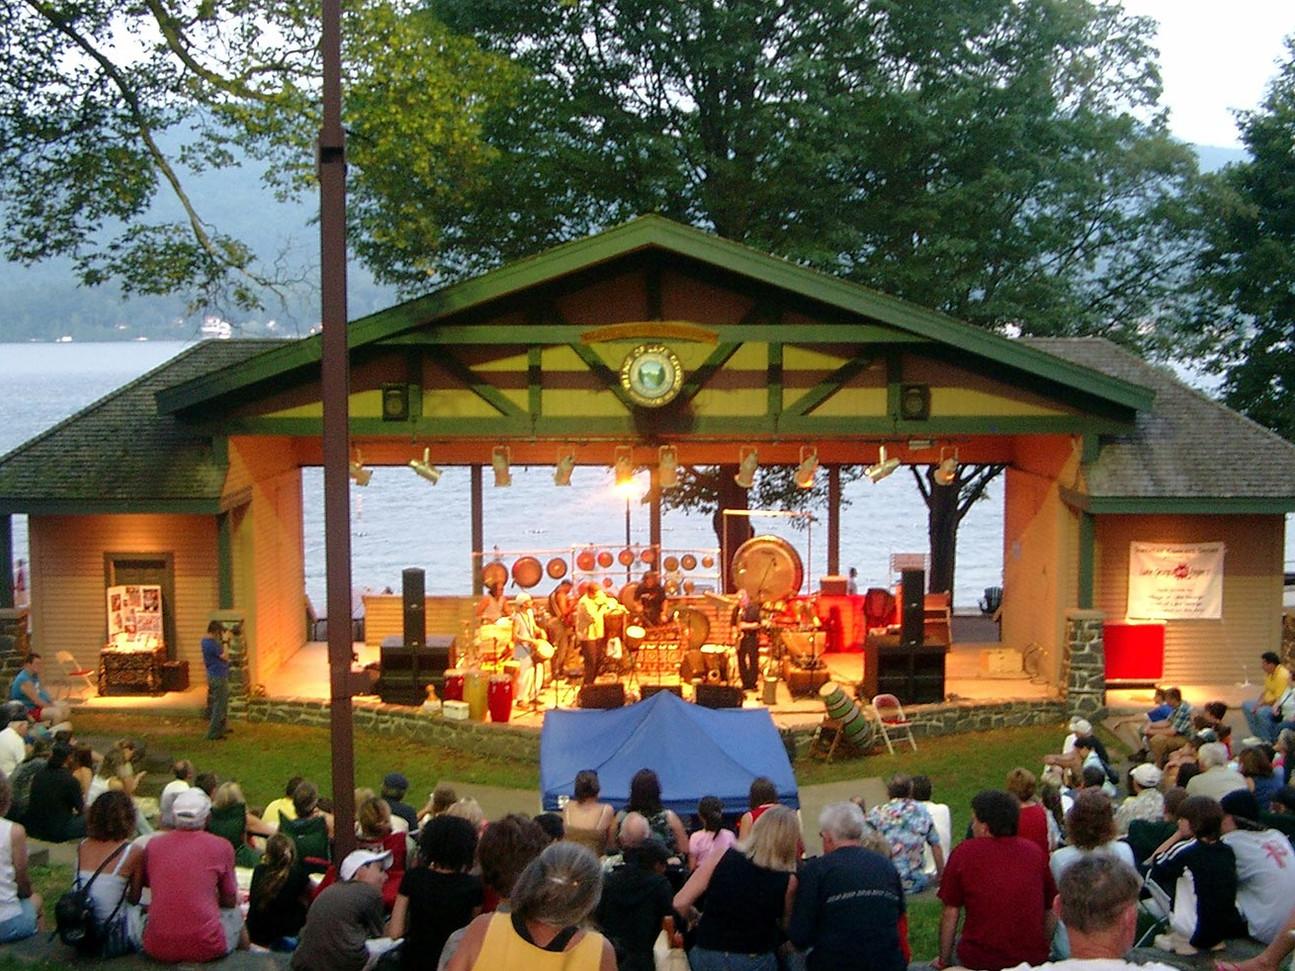 Lake Kora  Historic Adirondack Great Lake  New York State  August 2020